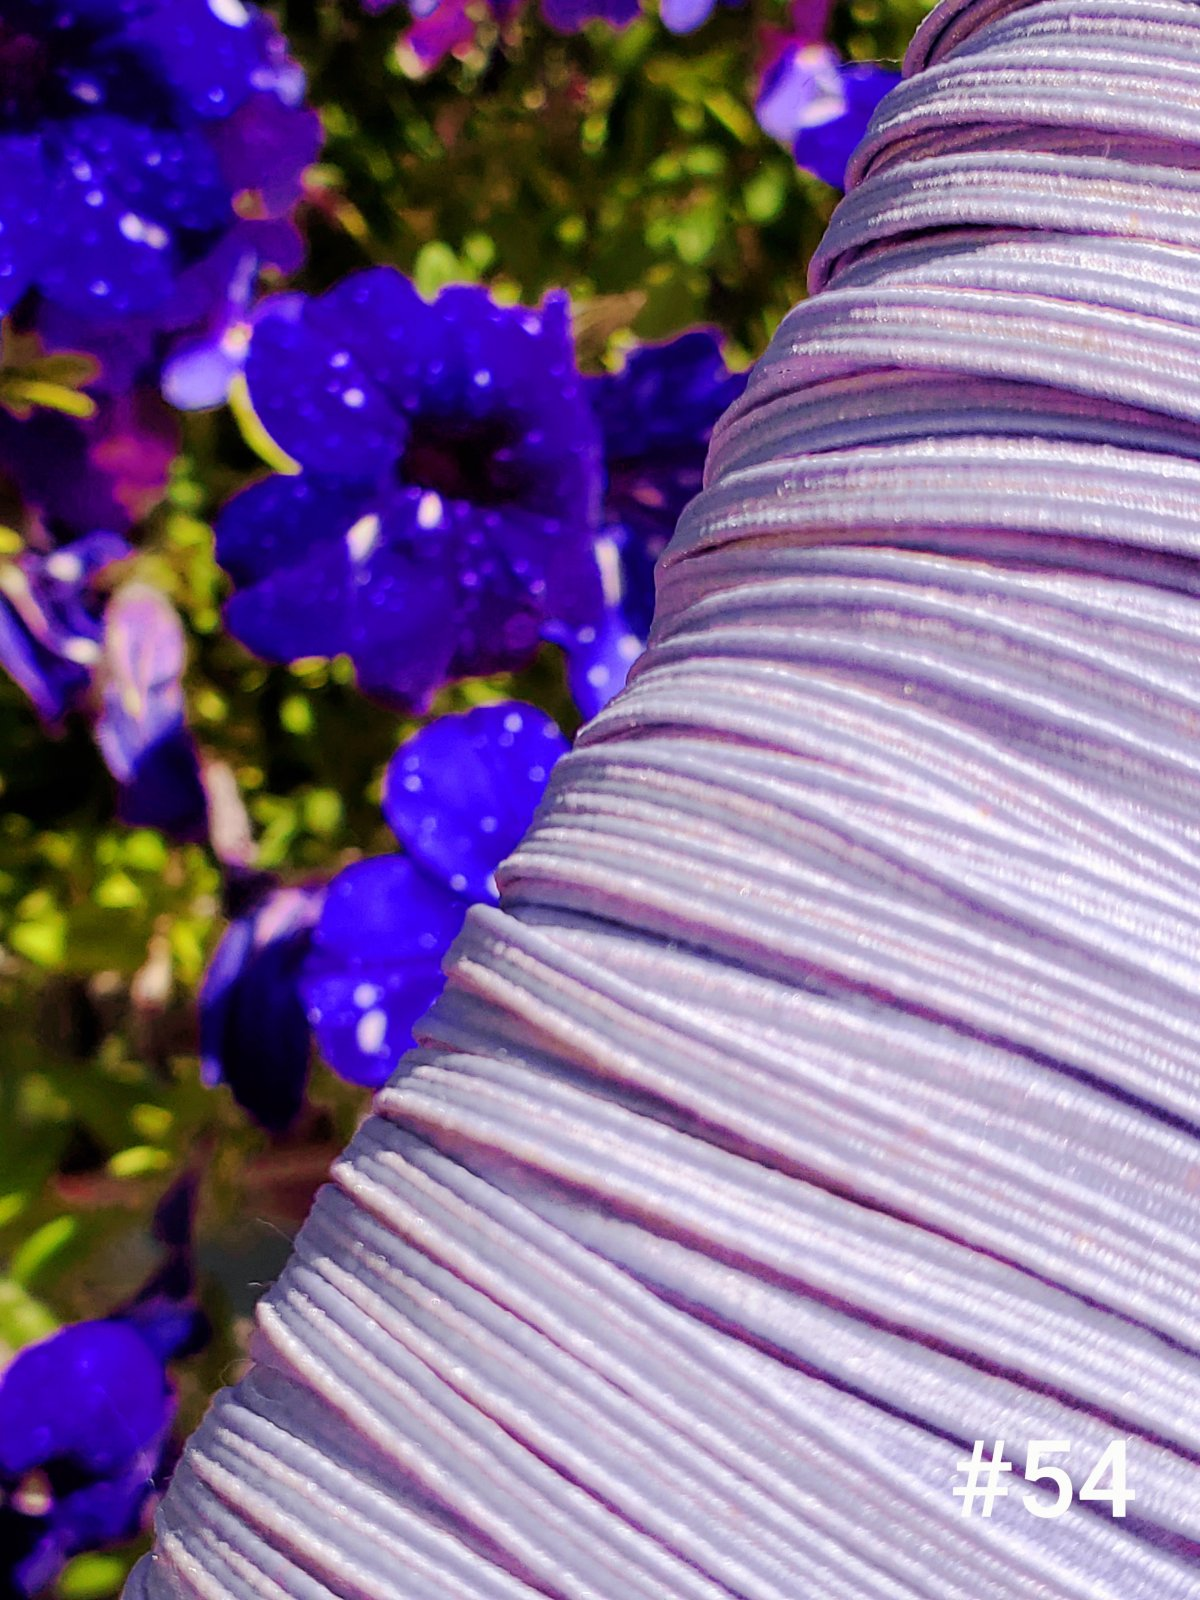 Cindy-rellas 1/8 inch (3mm) Elastic - Light Purple